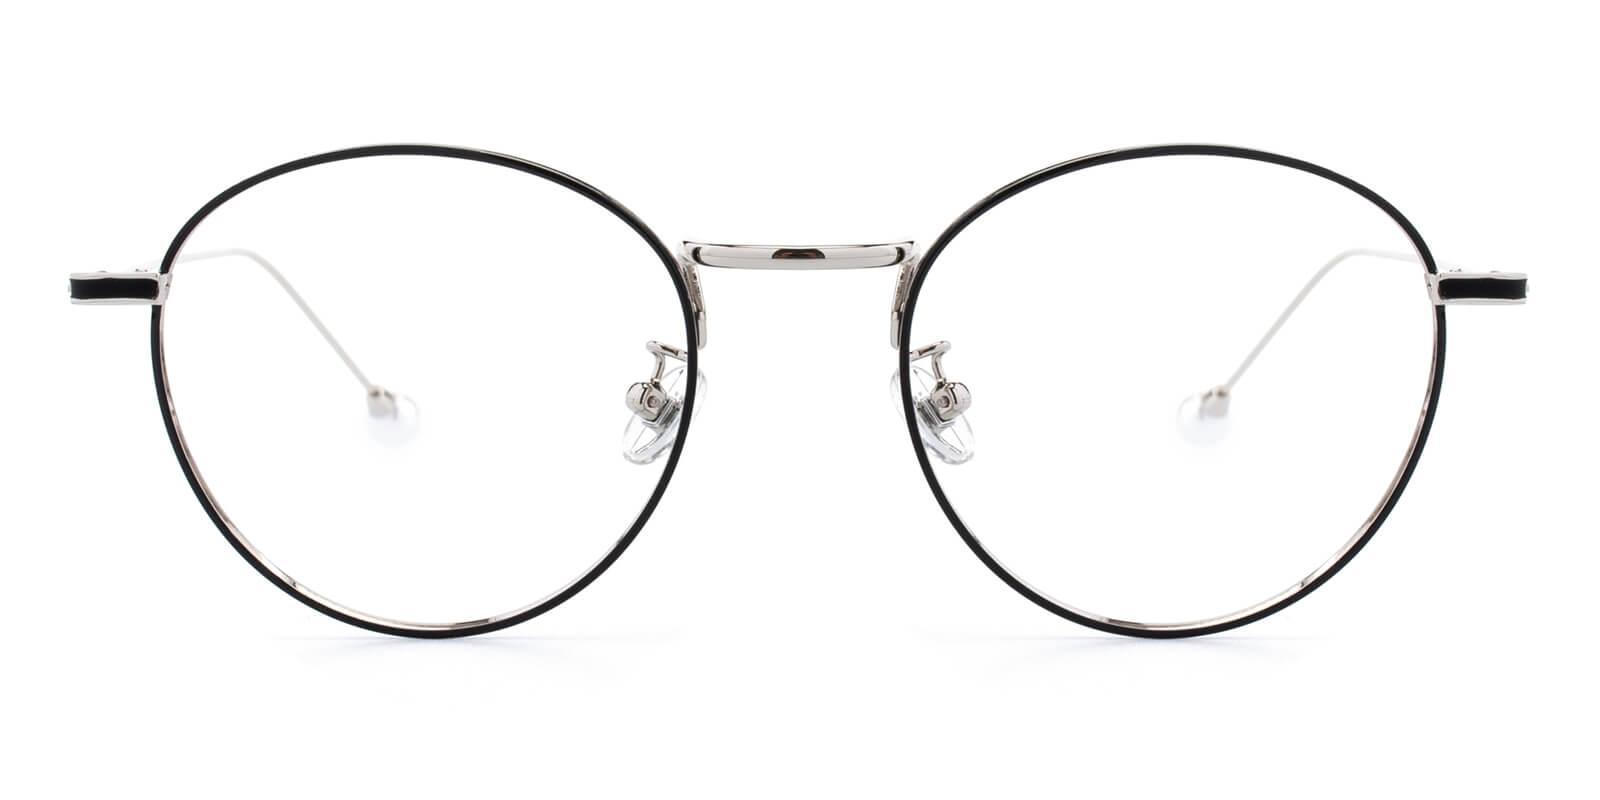 Frail-Silver-Round-Metal-Eyeglasses-detail